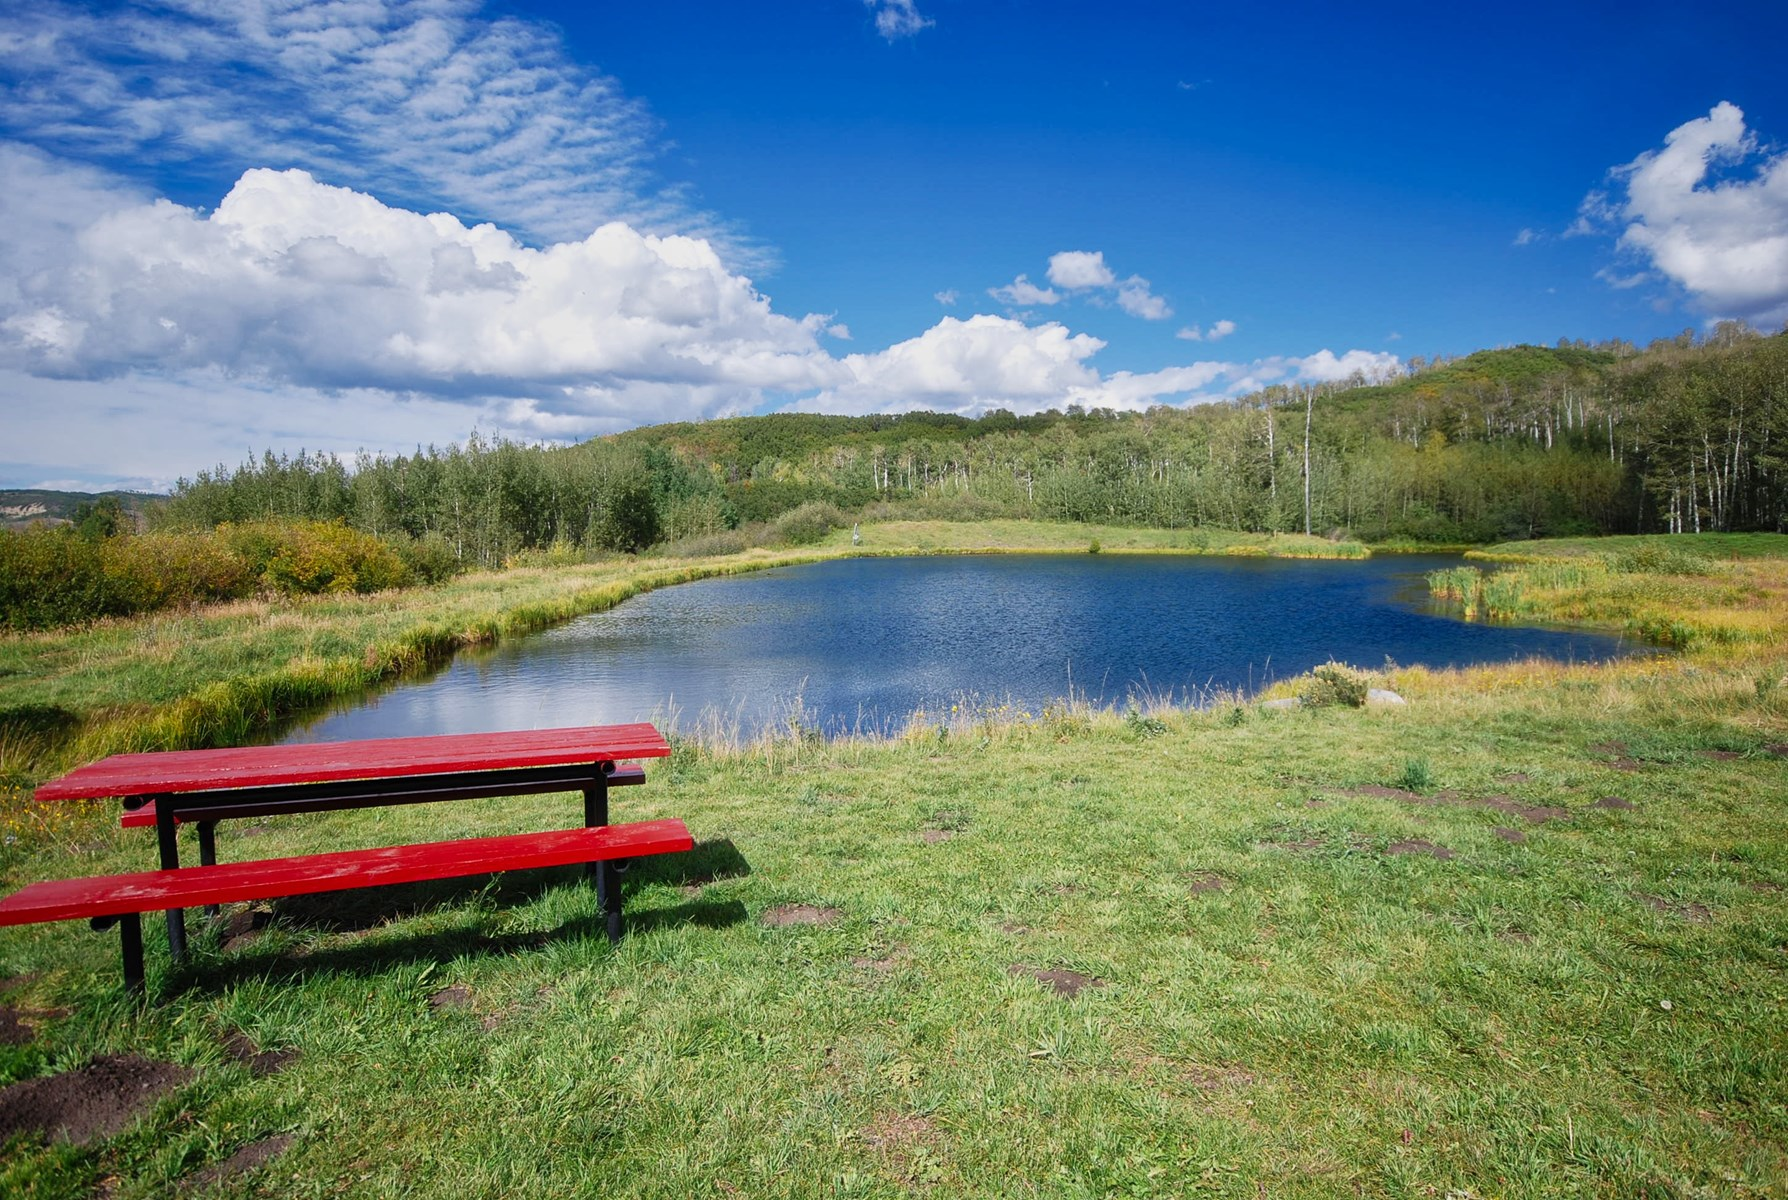 The Community Lake